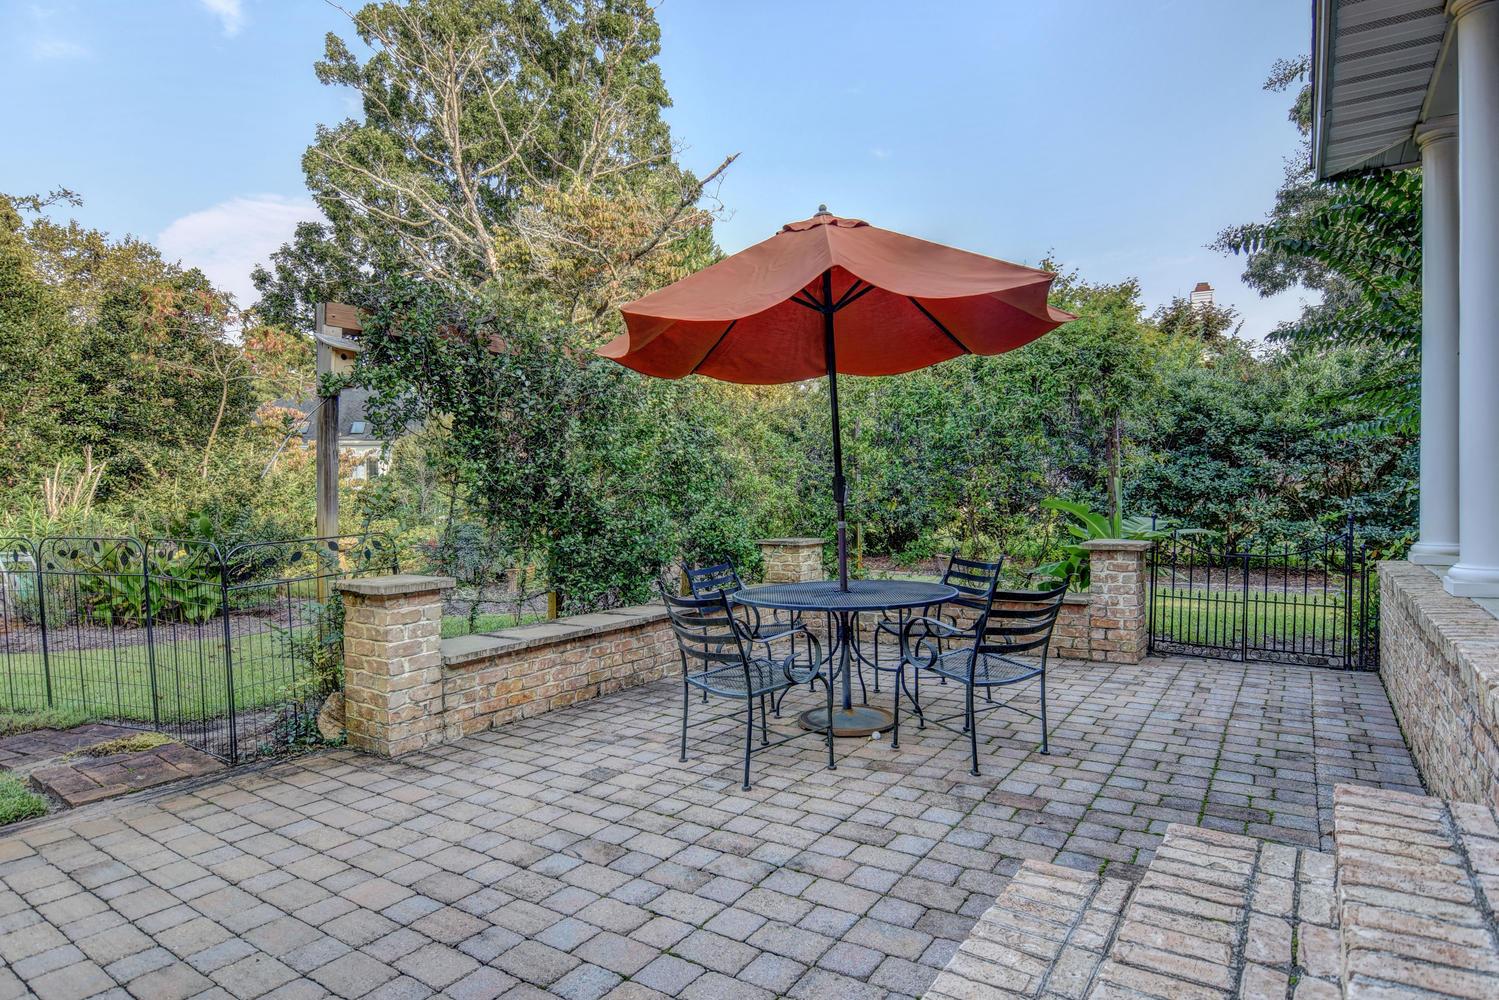 111 Golf Terrace Dr Hampstead-large-034-20-DSC 0565 6 7-1499x1000-72dpi.jpg